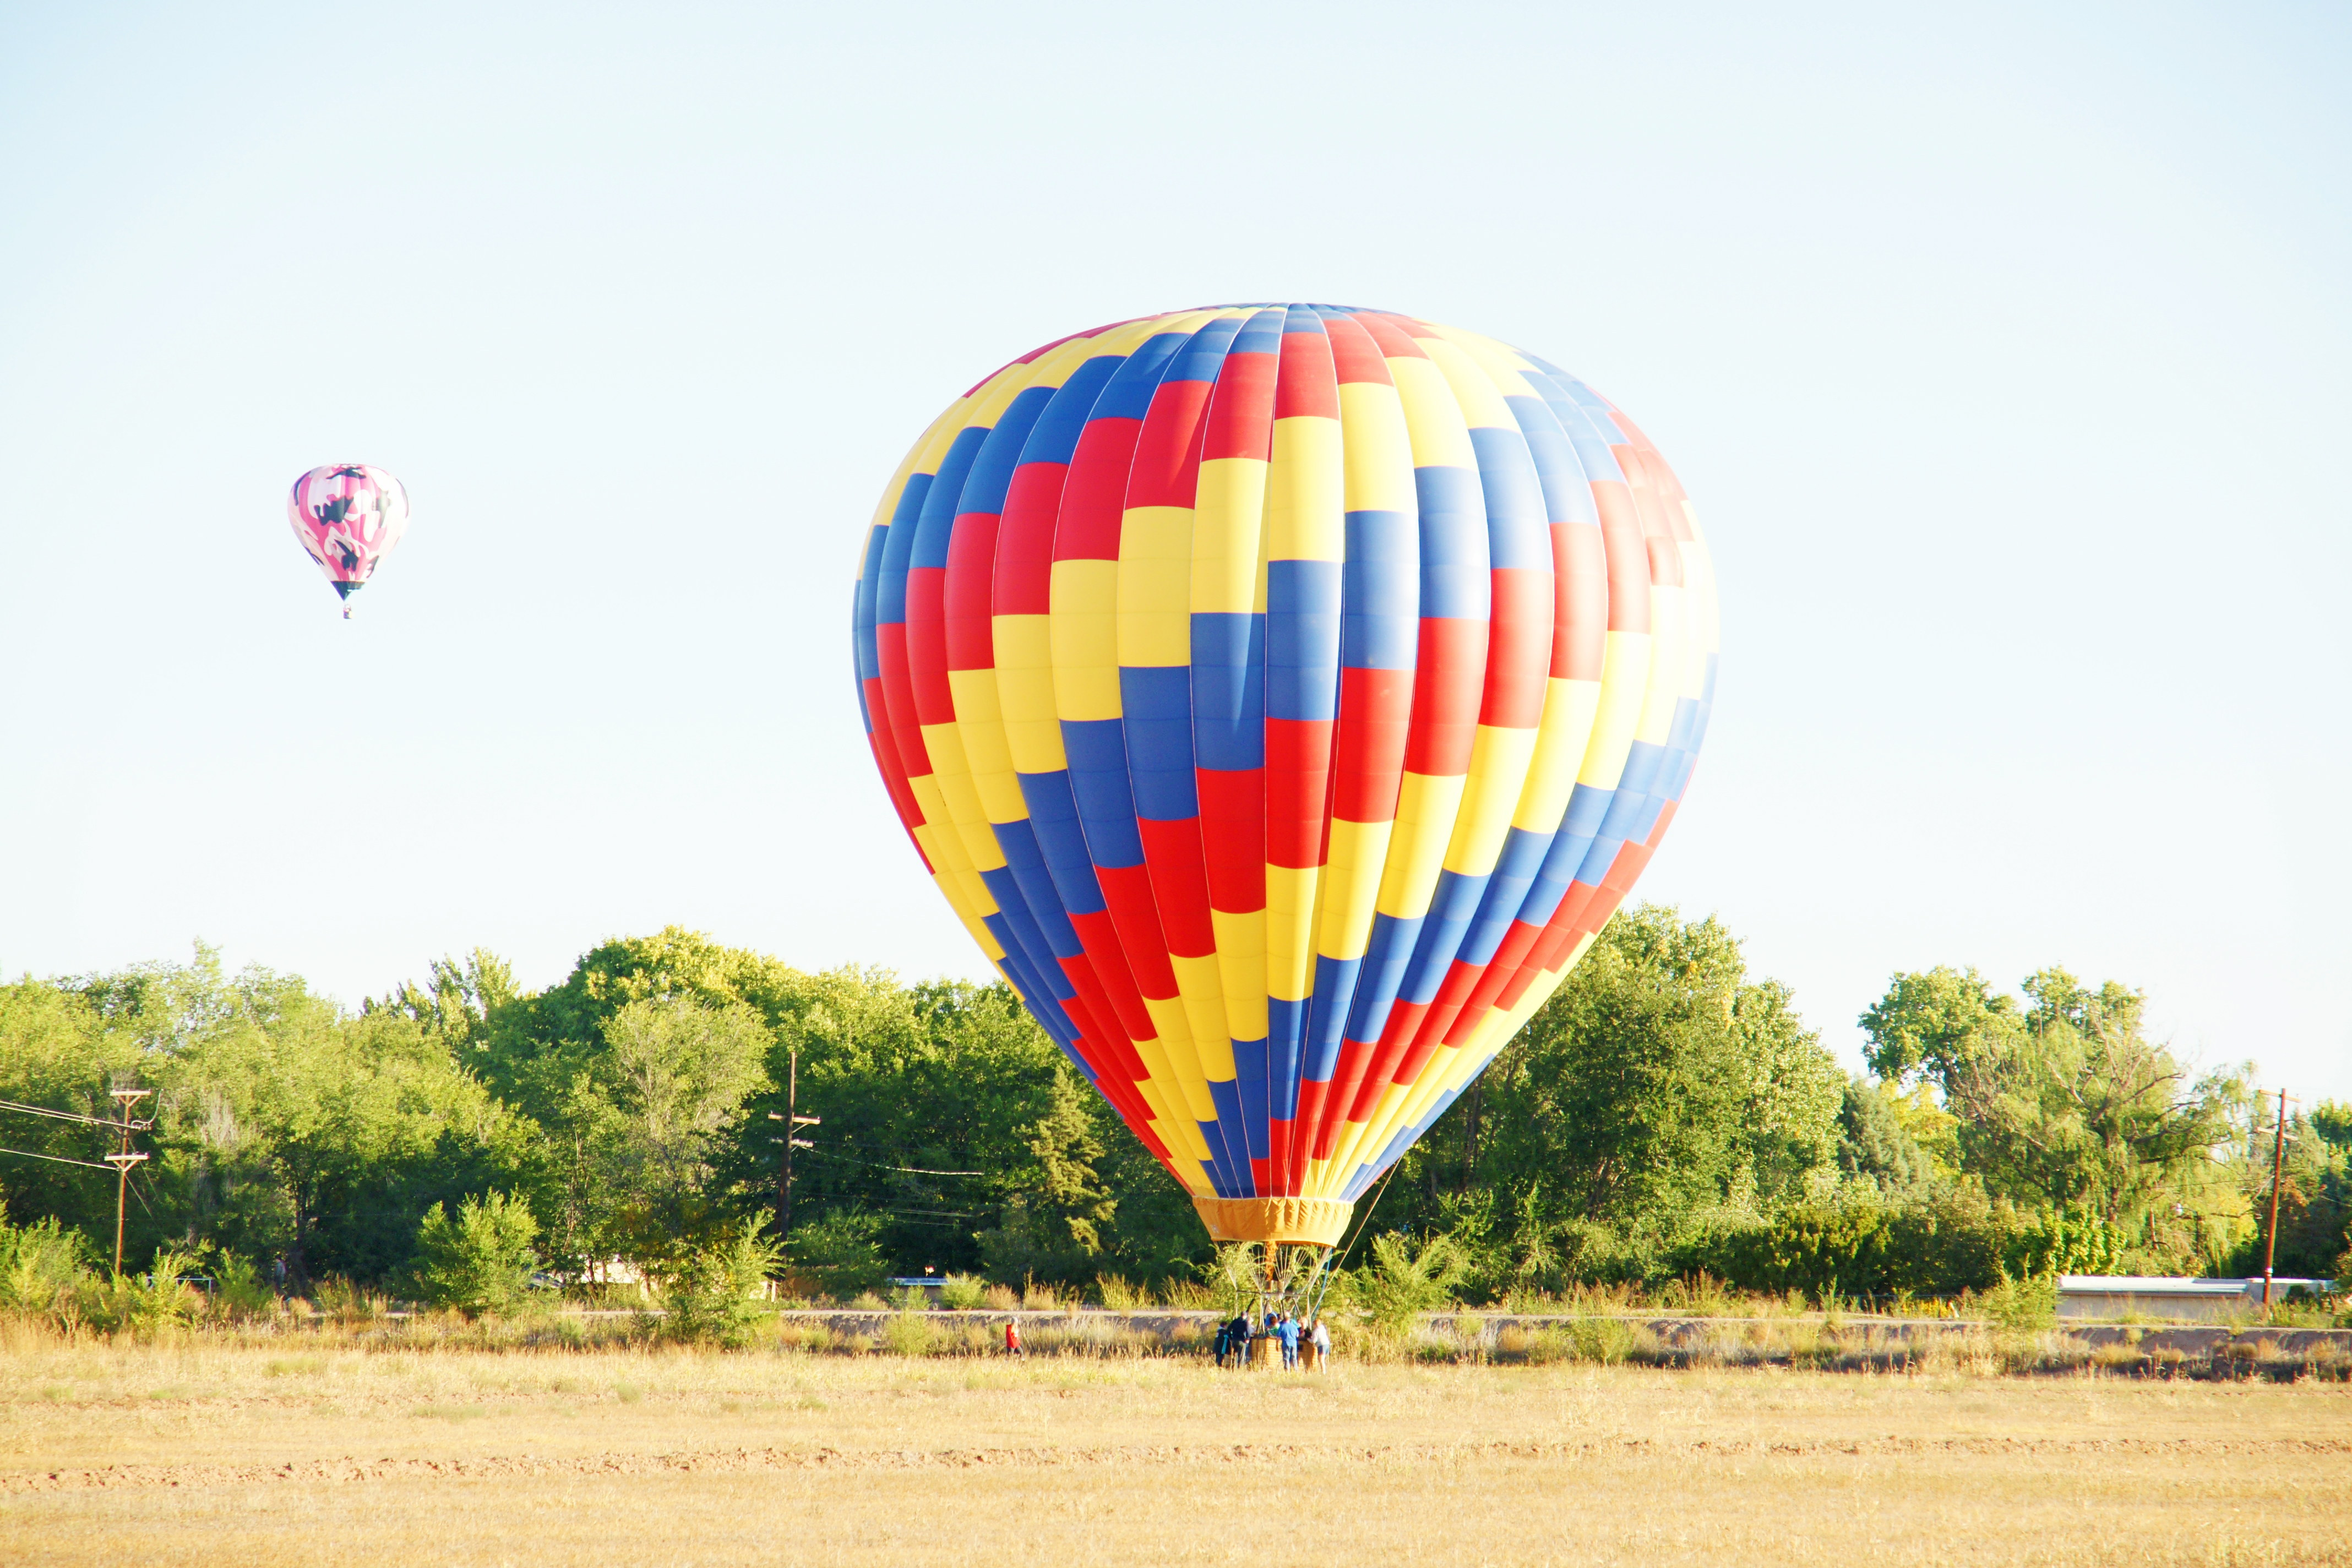 aibf-Balloon-Descent-Gallery09